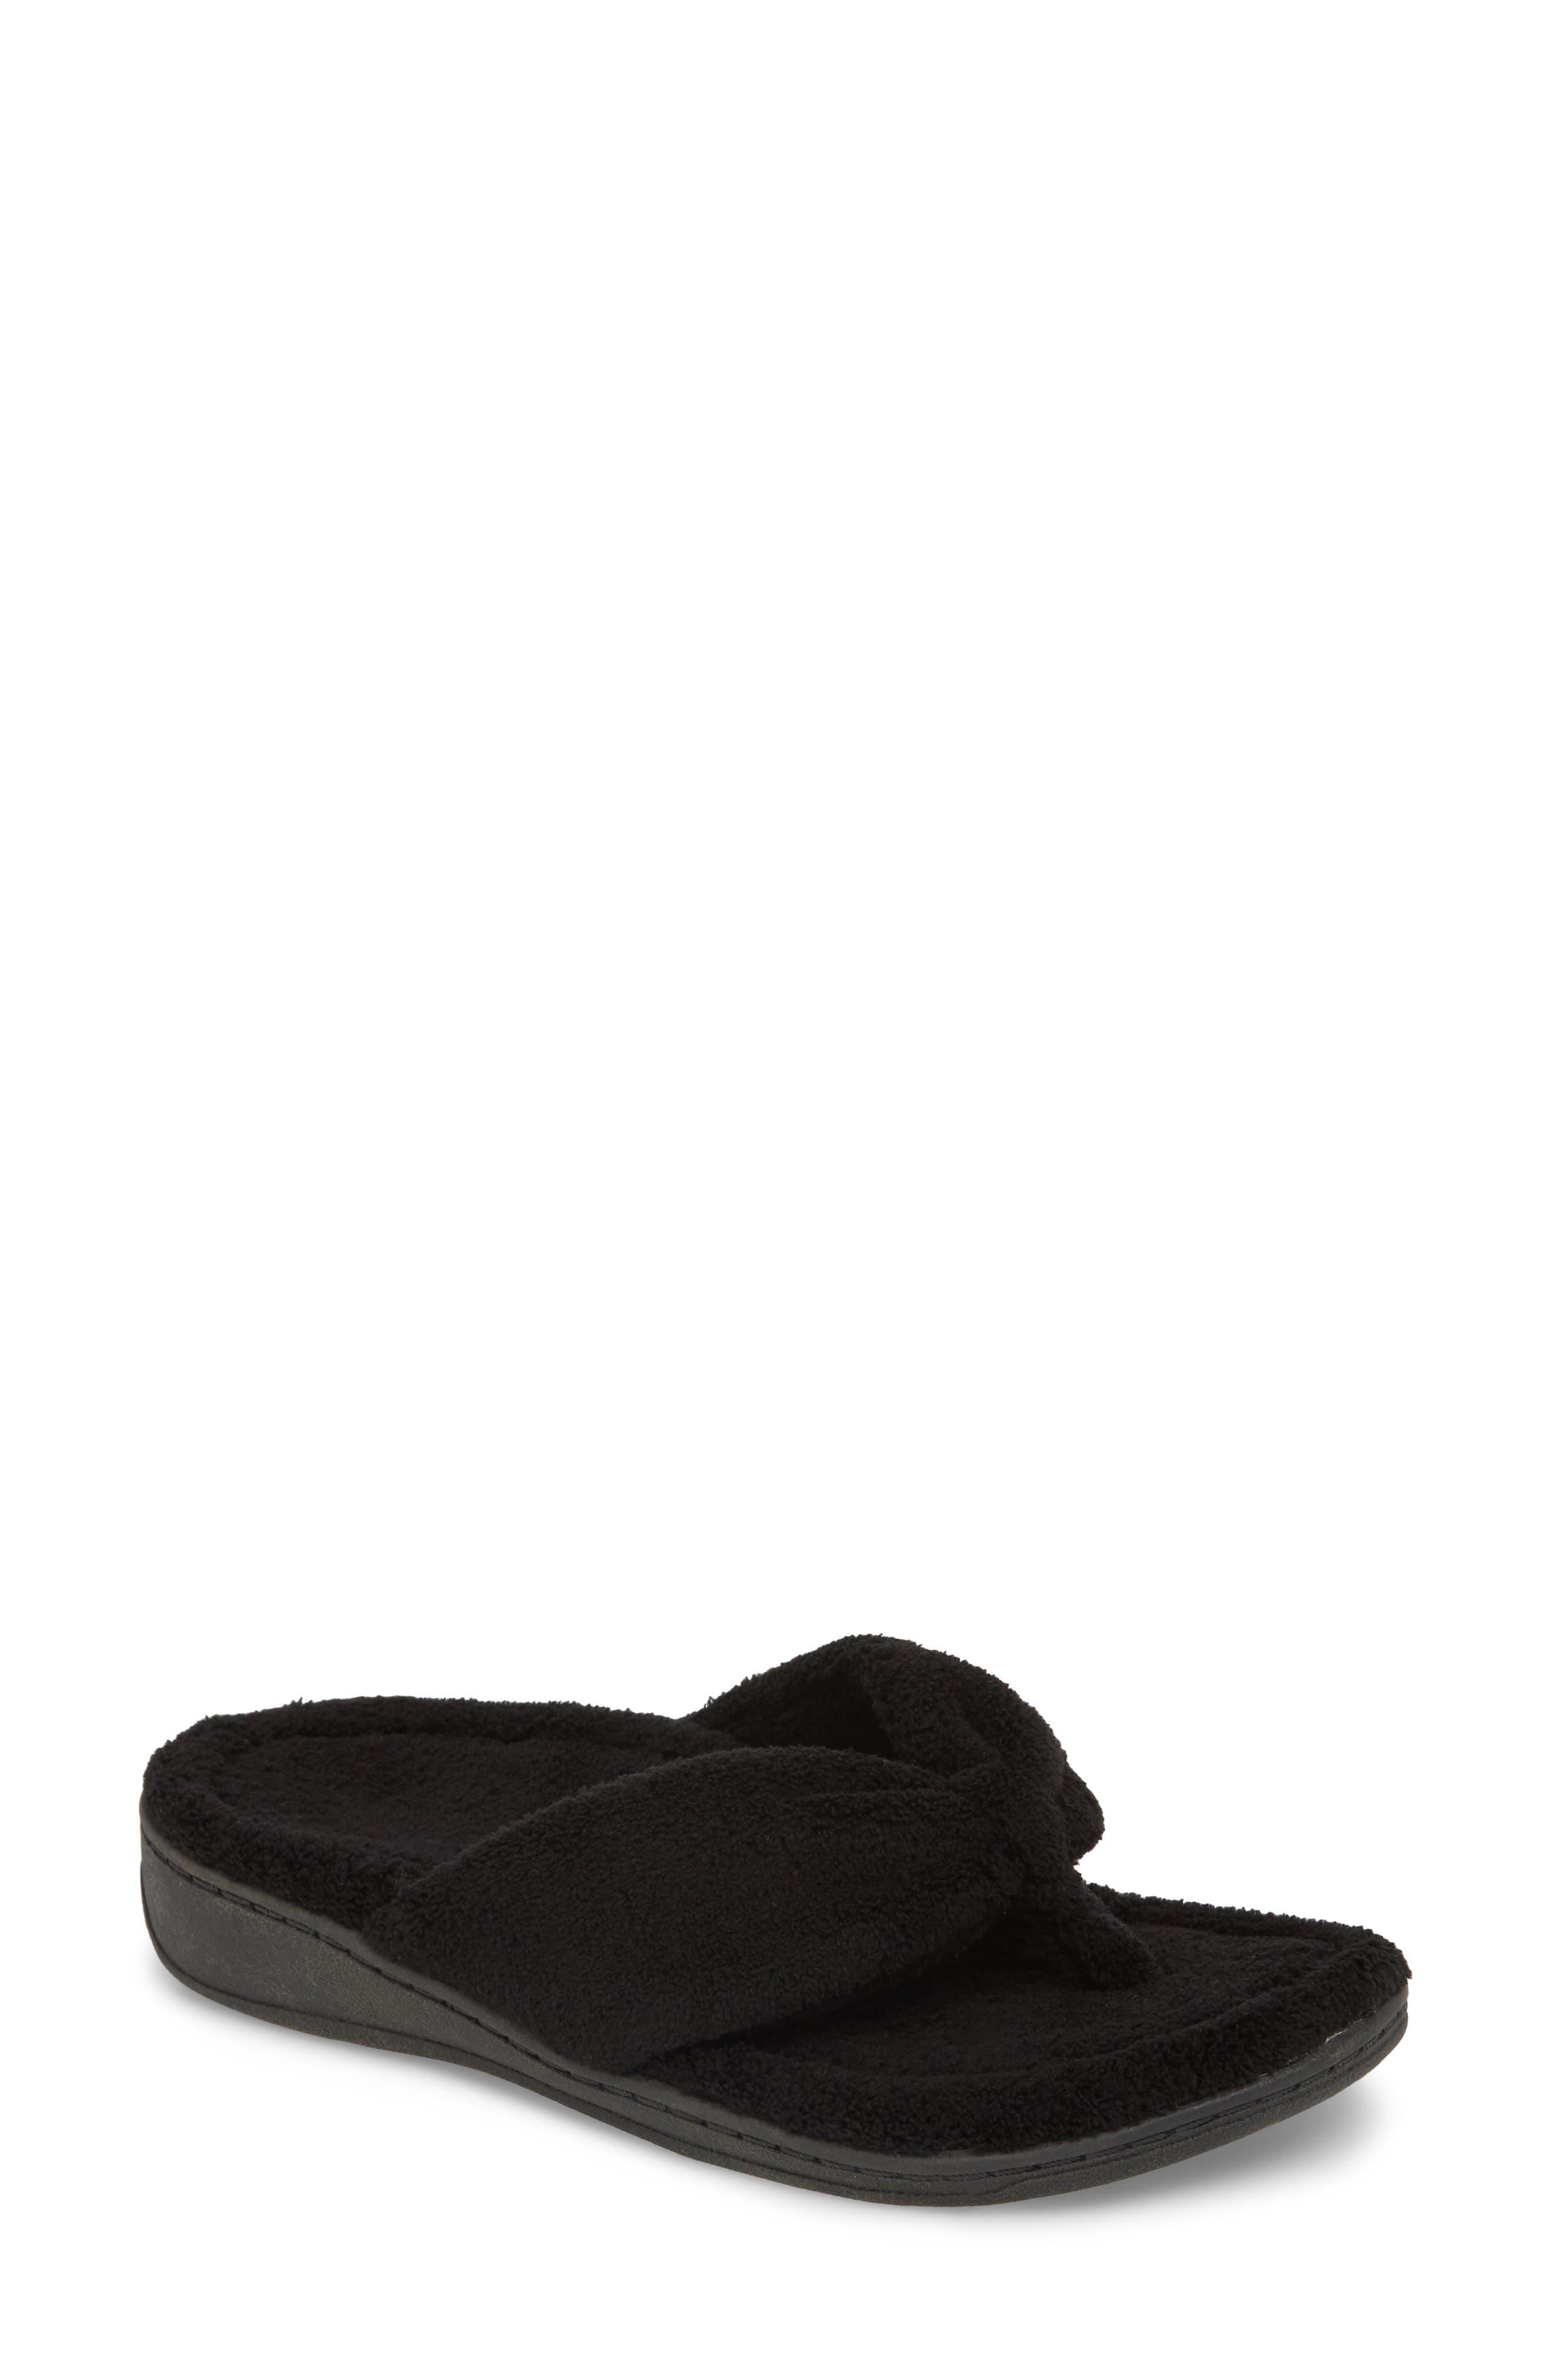 VIONIC Gracie Slipper, Main, color, BLACK